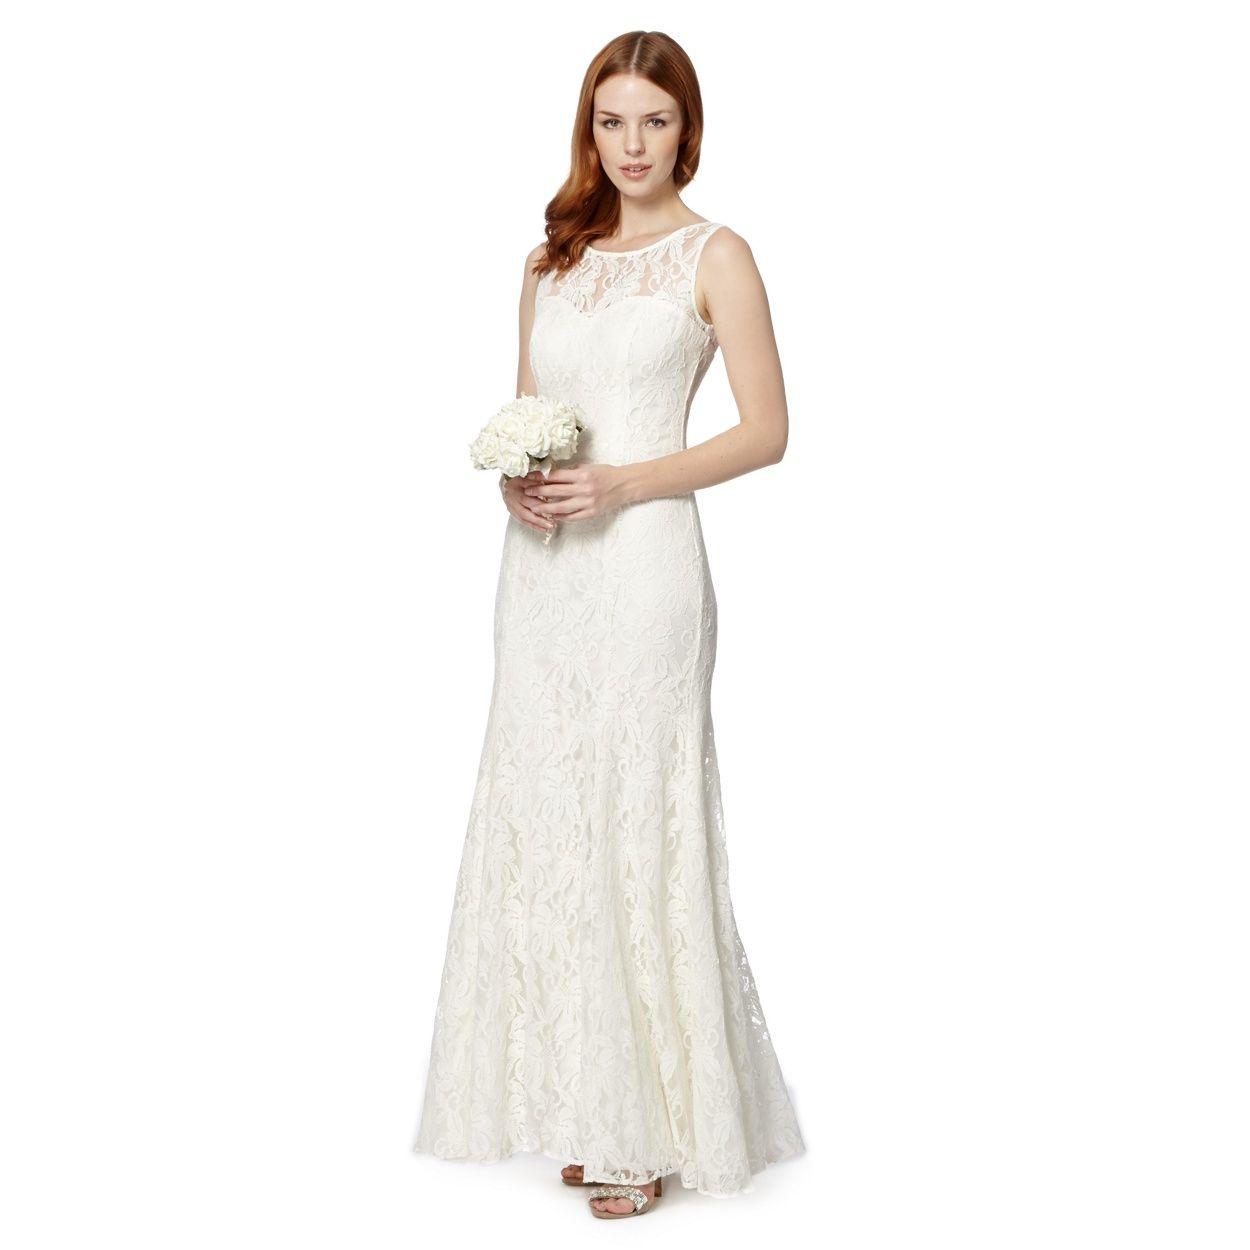 Debut Ivory lace wedding dress- at Debenhams.com Nice shape, bit ...